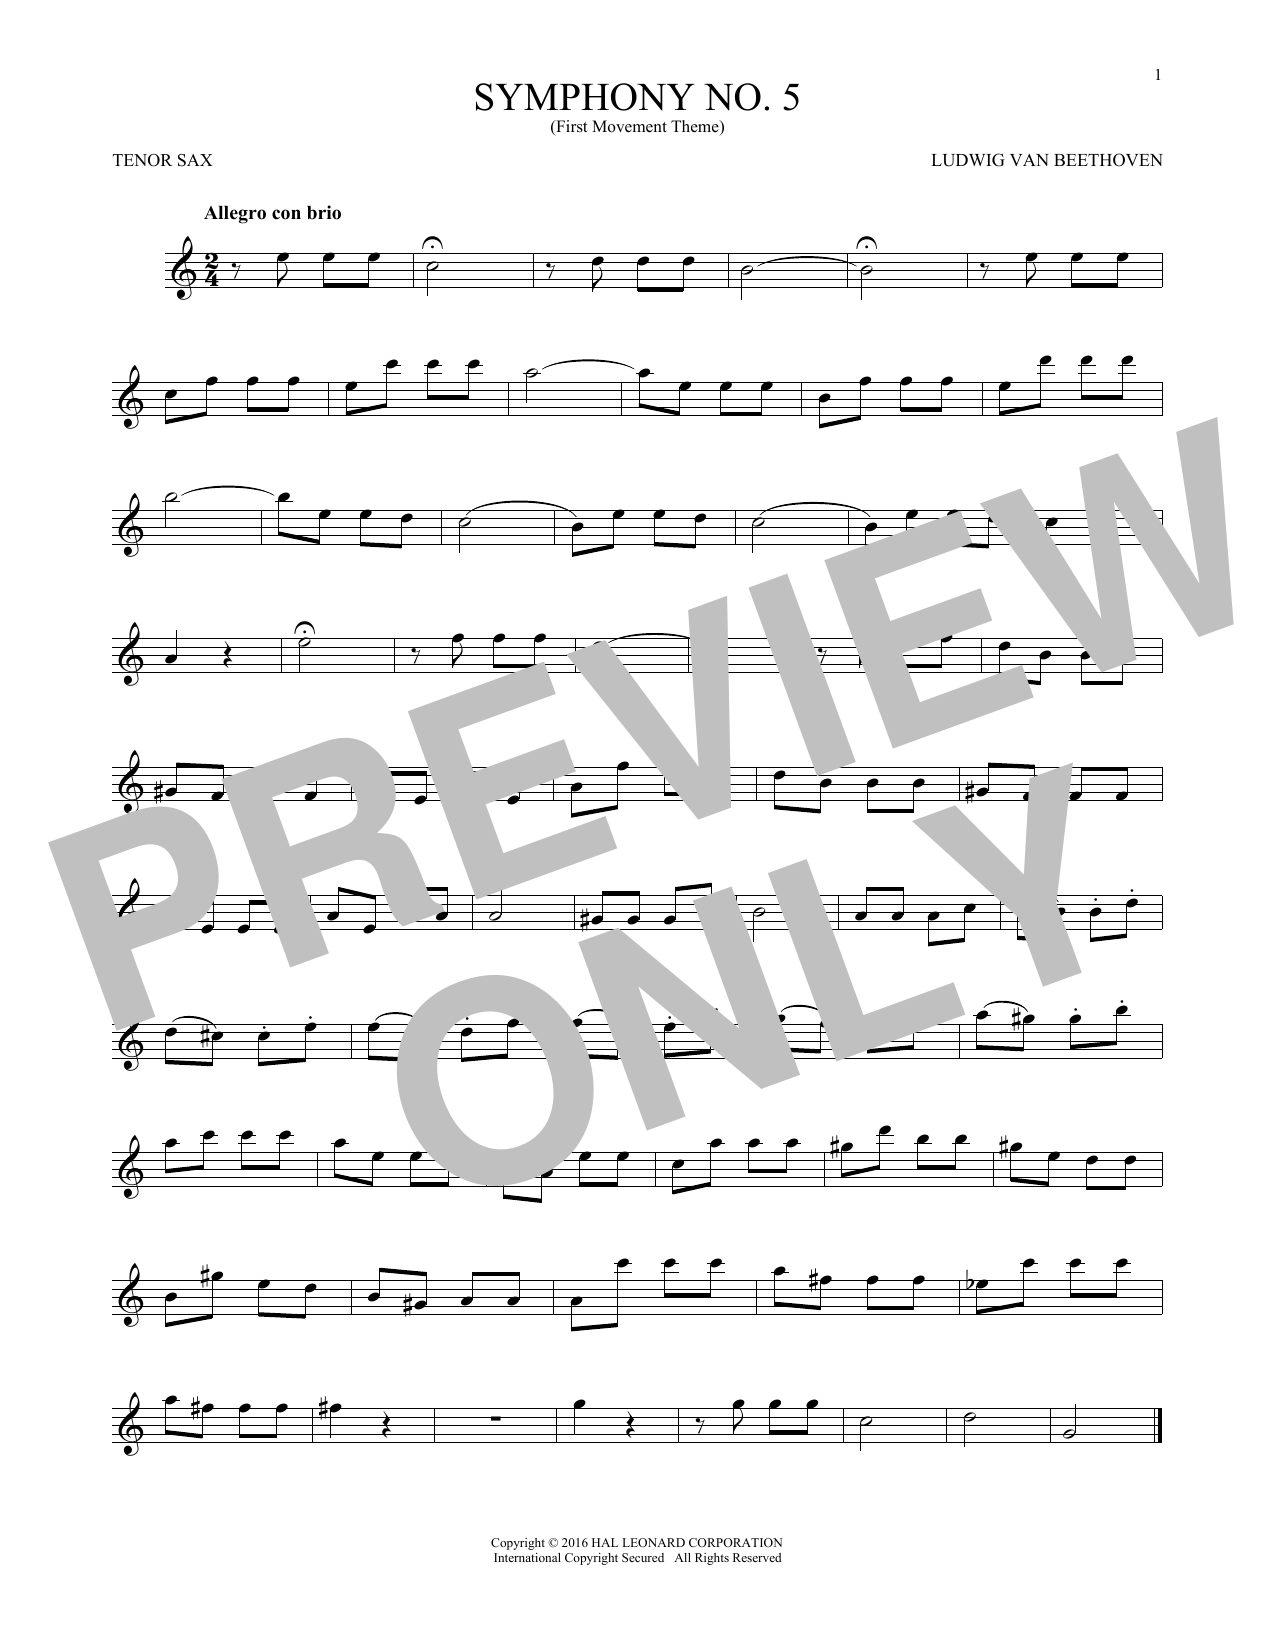 Symphony No. 5 In C Minor, First Movement Excerpt (Tenor Sax Solo)